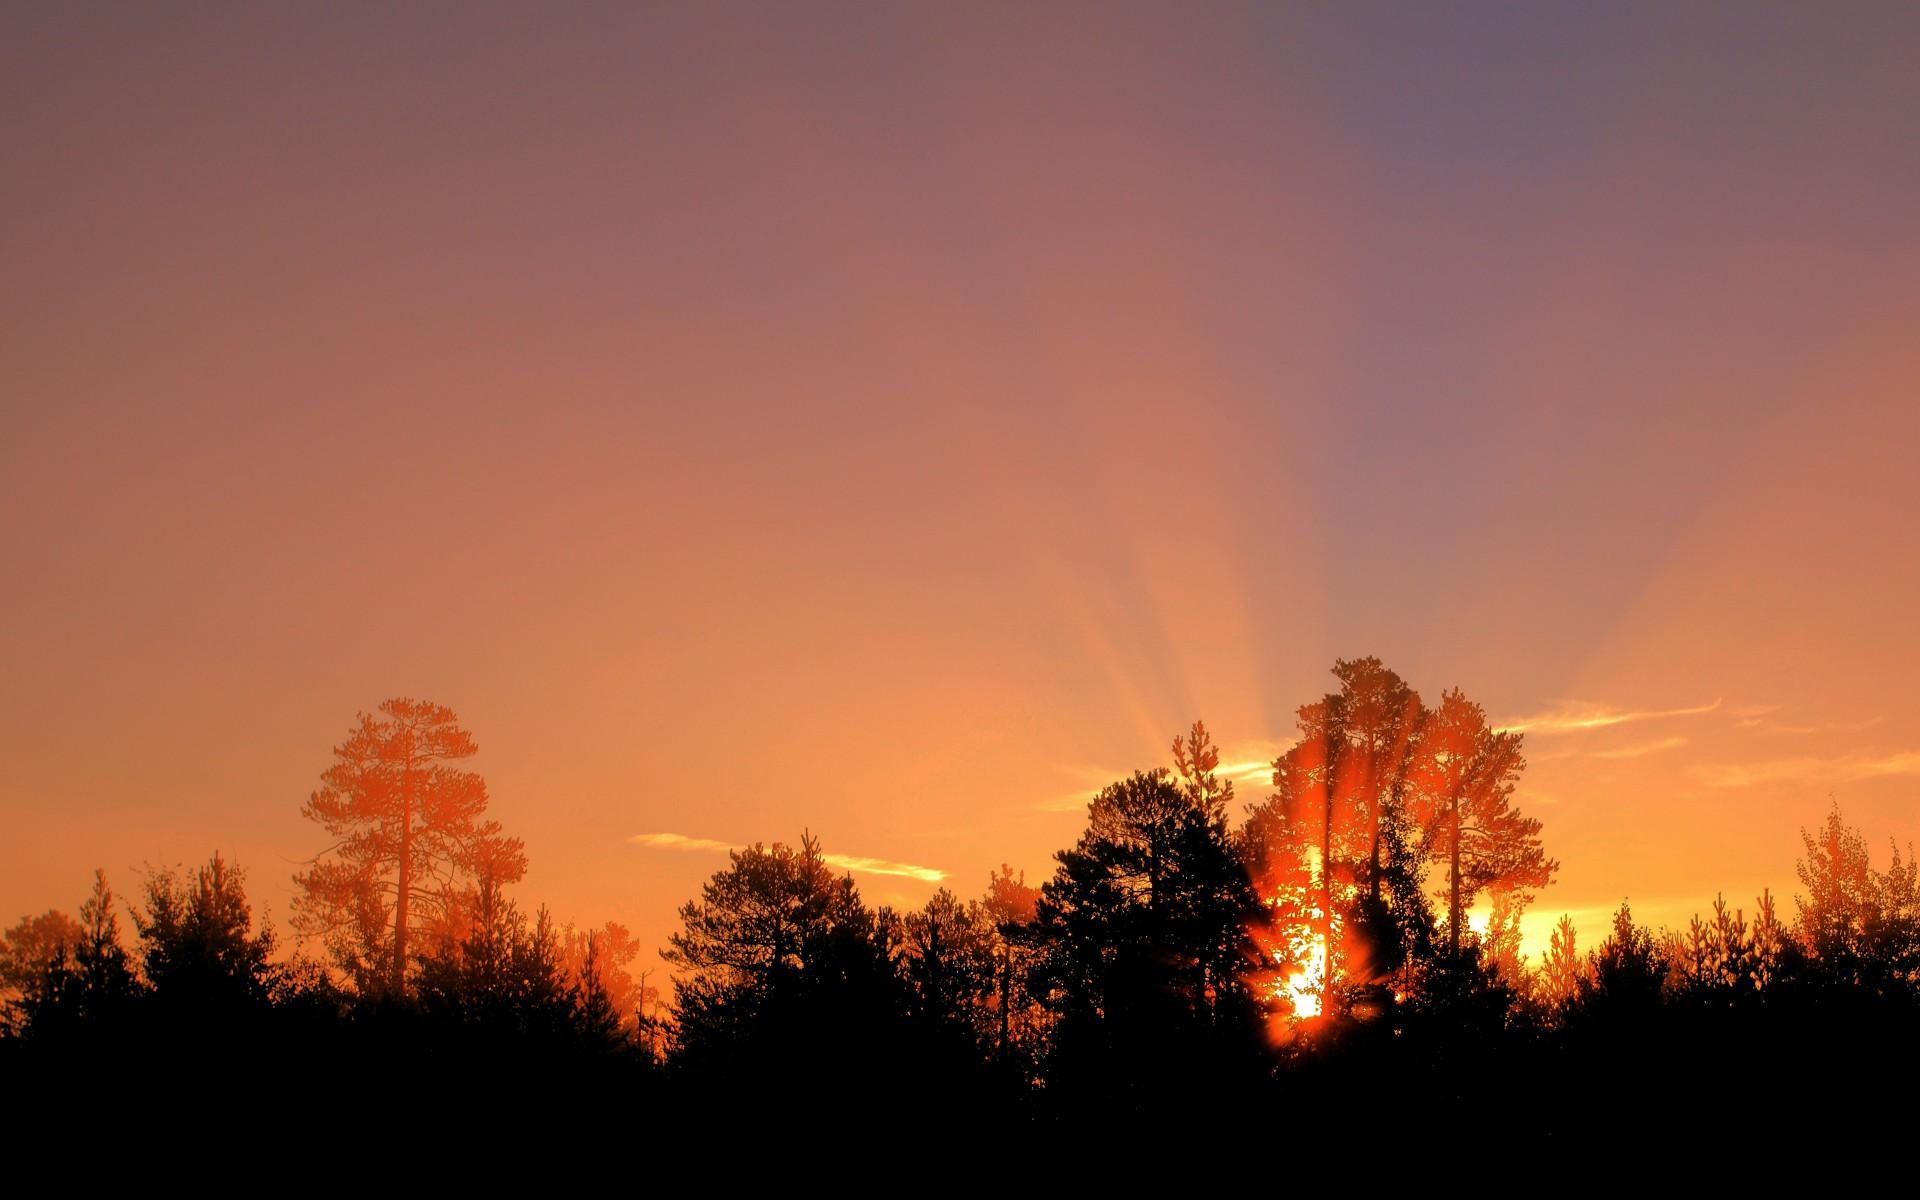 Nature sunrise sunset color sunlight sunbeam trees forest sky